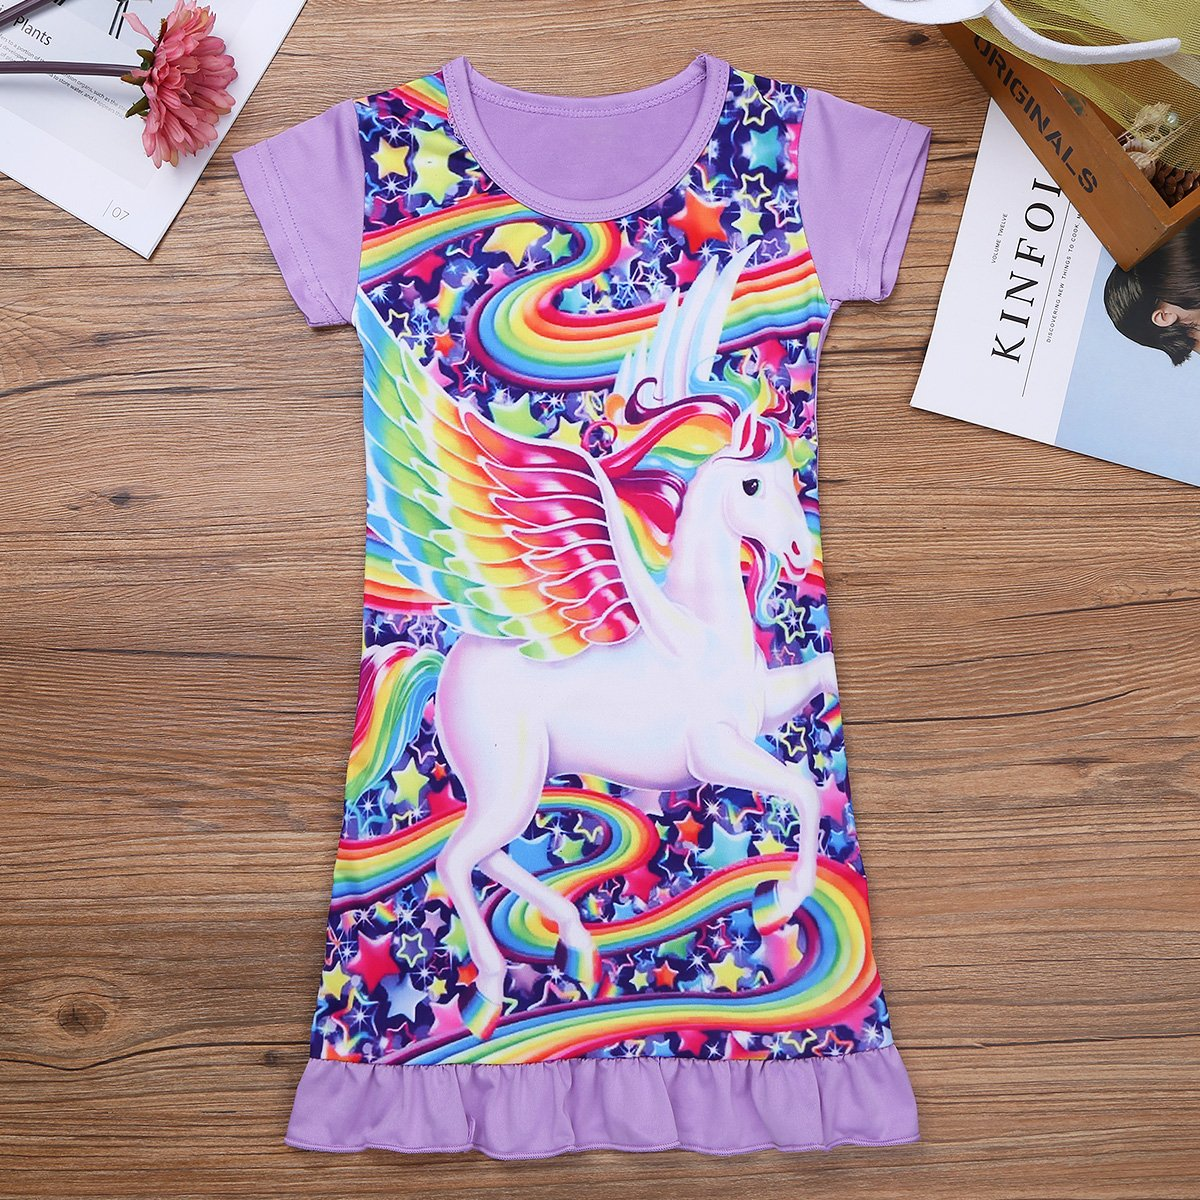 32e865f9cbbee YiZYiF Enfant Fille Licorne Chemise de Nuit Cartoon Pyjama Manches Courtes  Robe de Nuit Robe Licorne ...